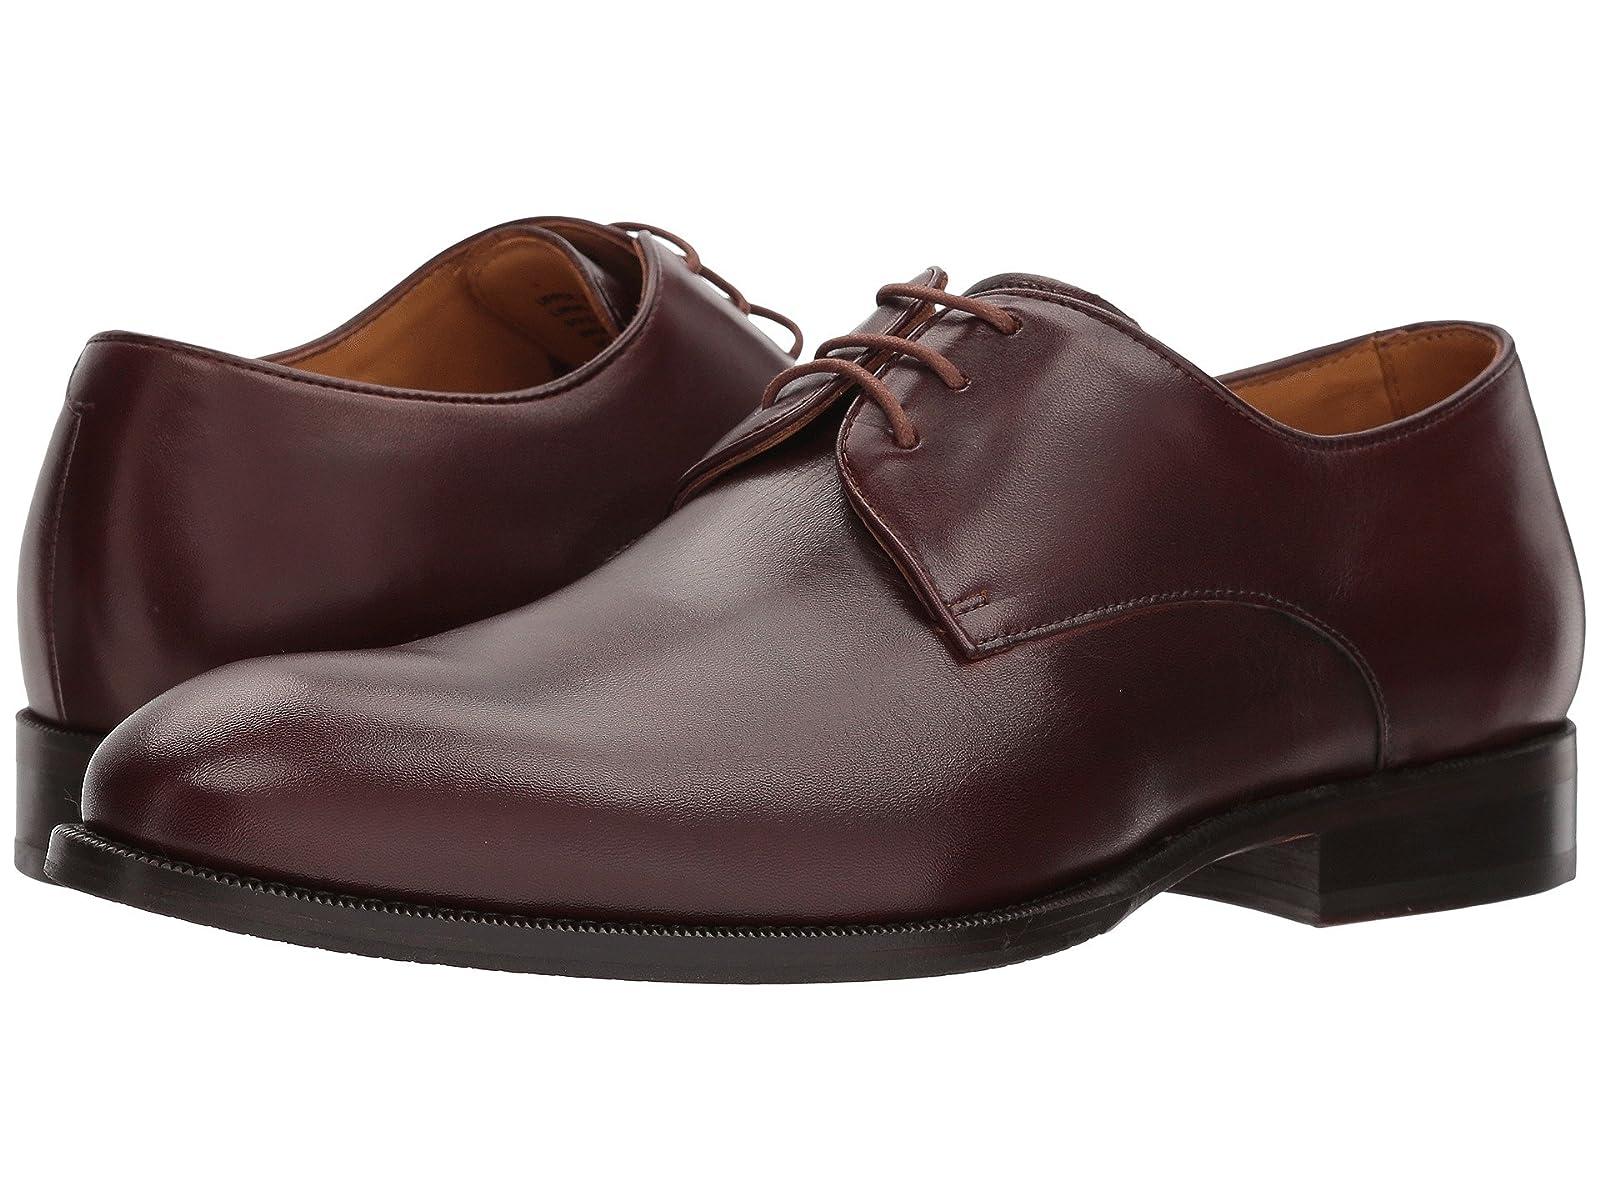 Vince Camuto BroganAtmospheric grades have affordable shoes